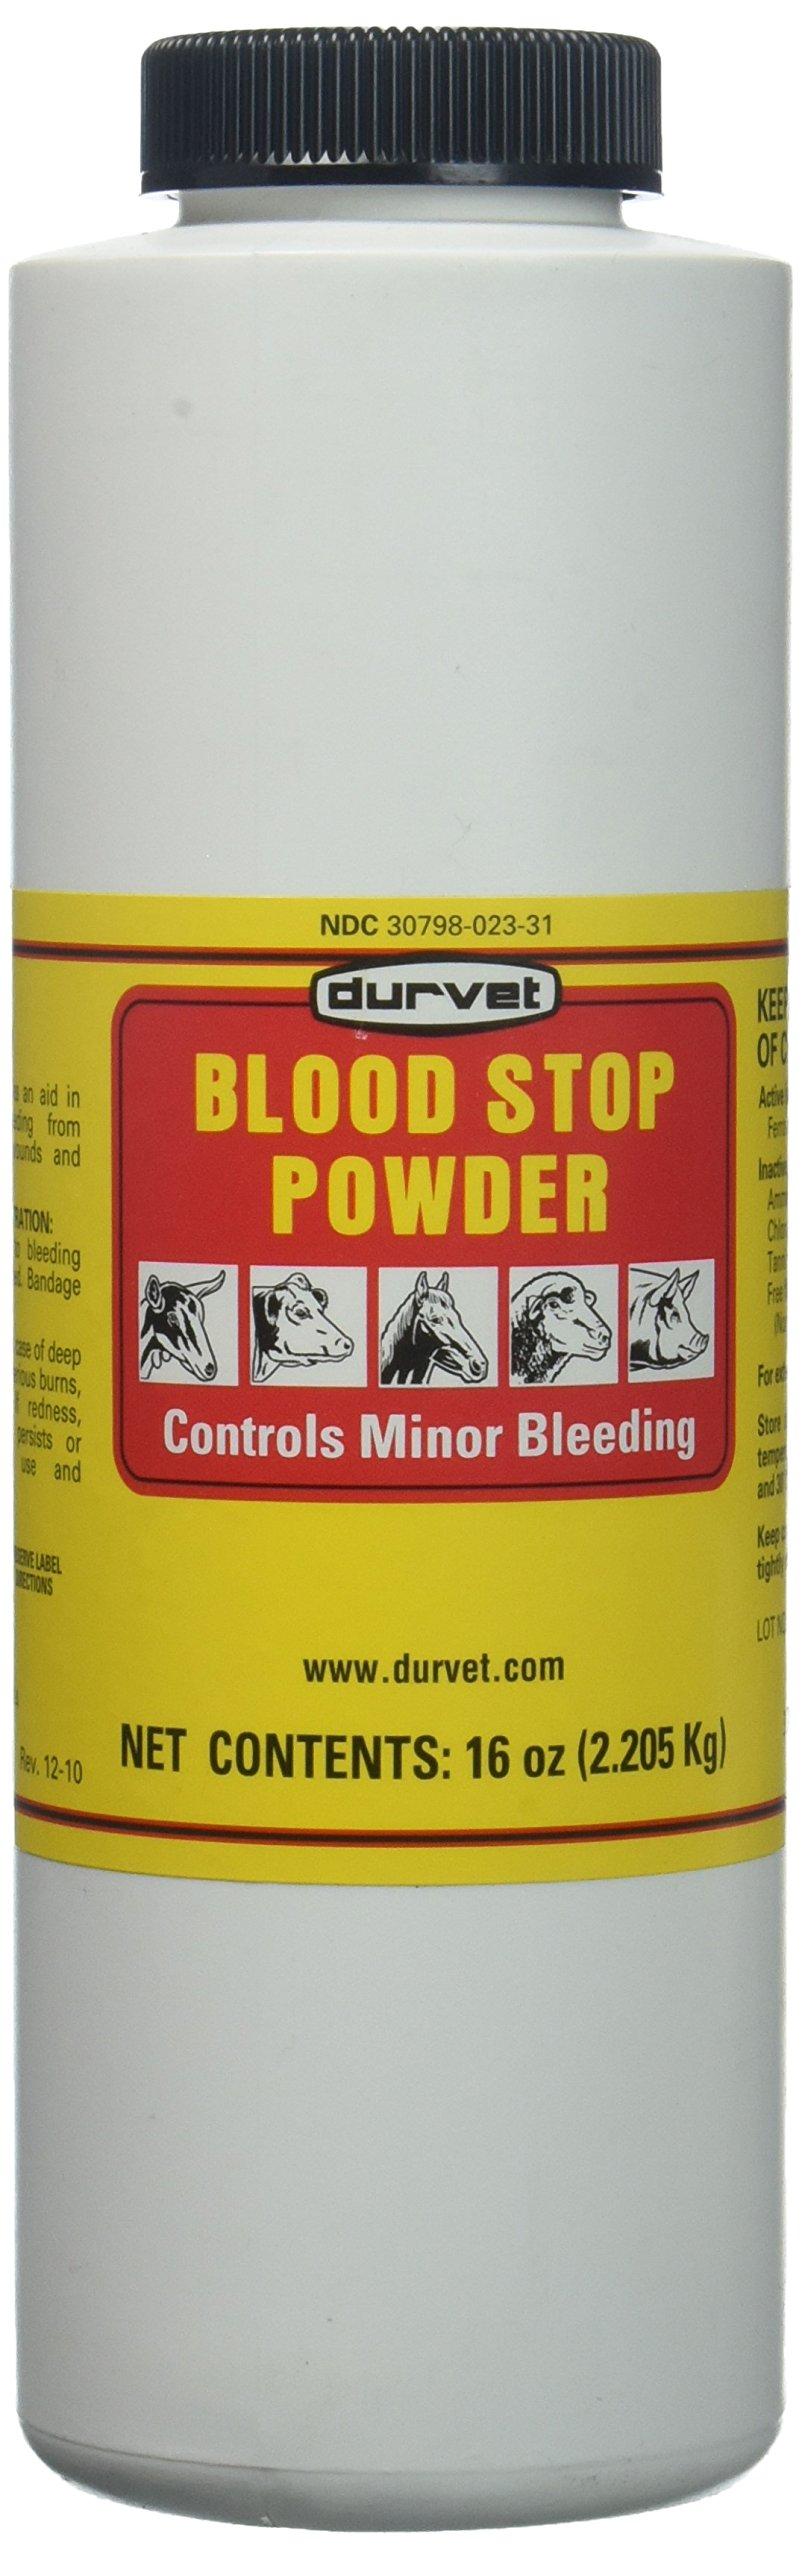 Durvet Blood Stop Powder 16 Oz